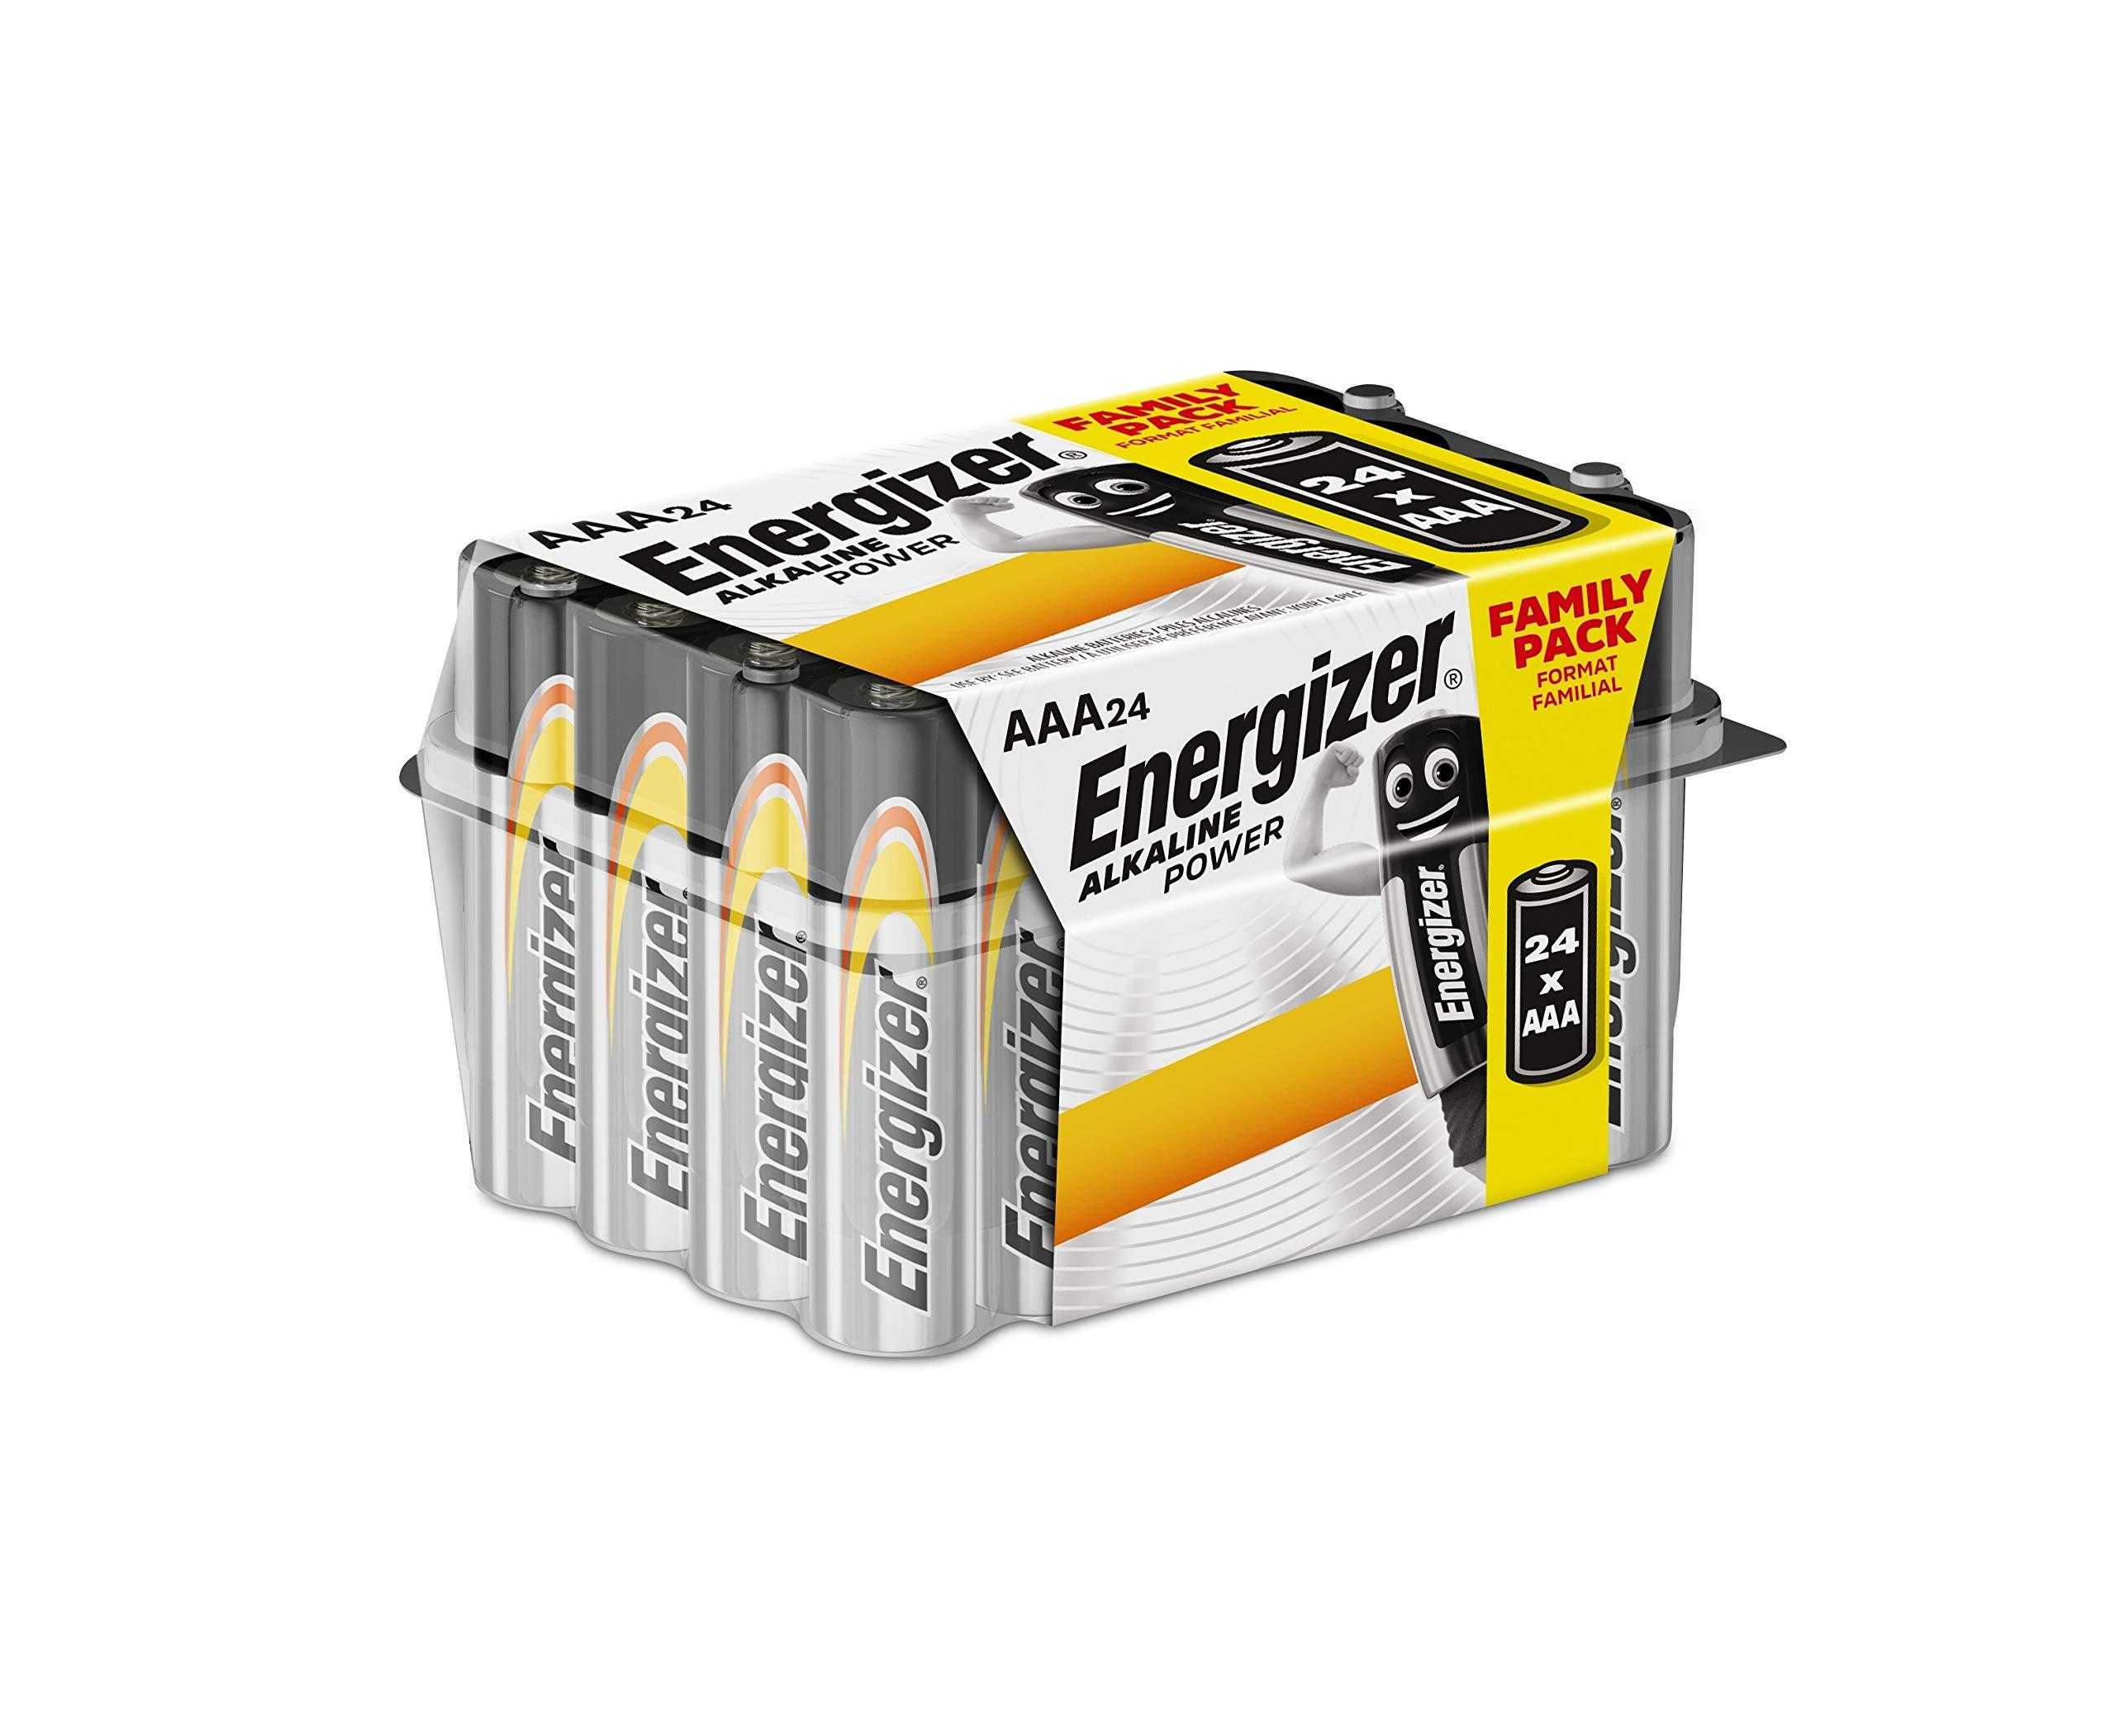 Energizer E92 - Pack de 24 pilas alcalinas AAA, color negro: Amazon.es: Electrónica